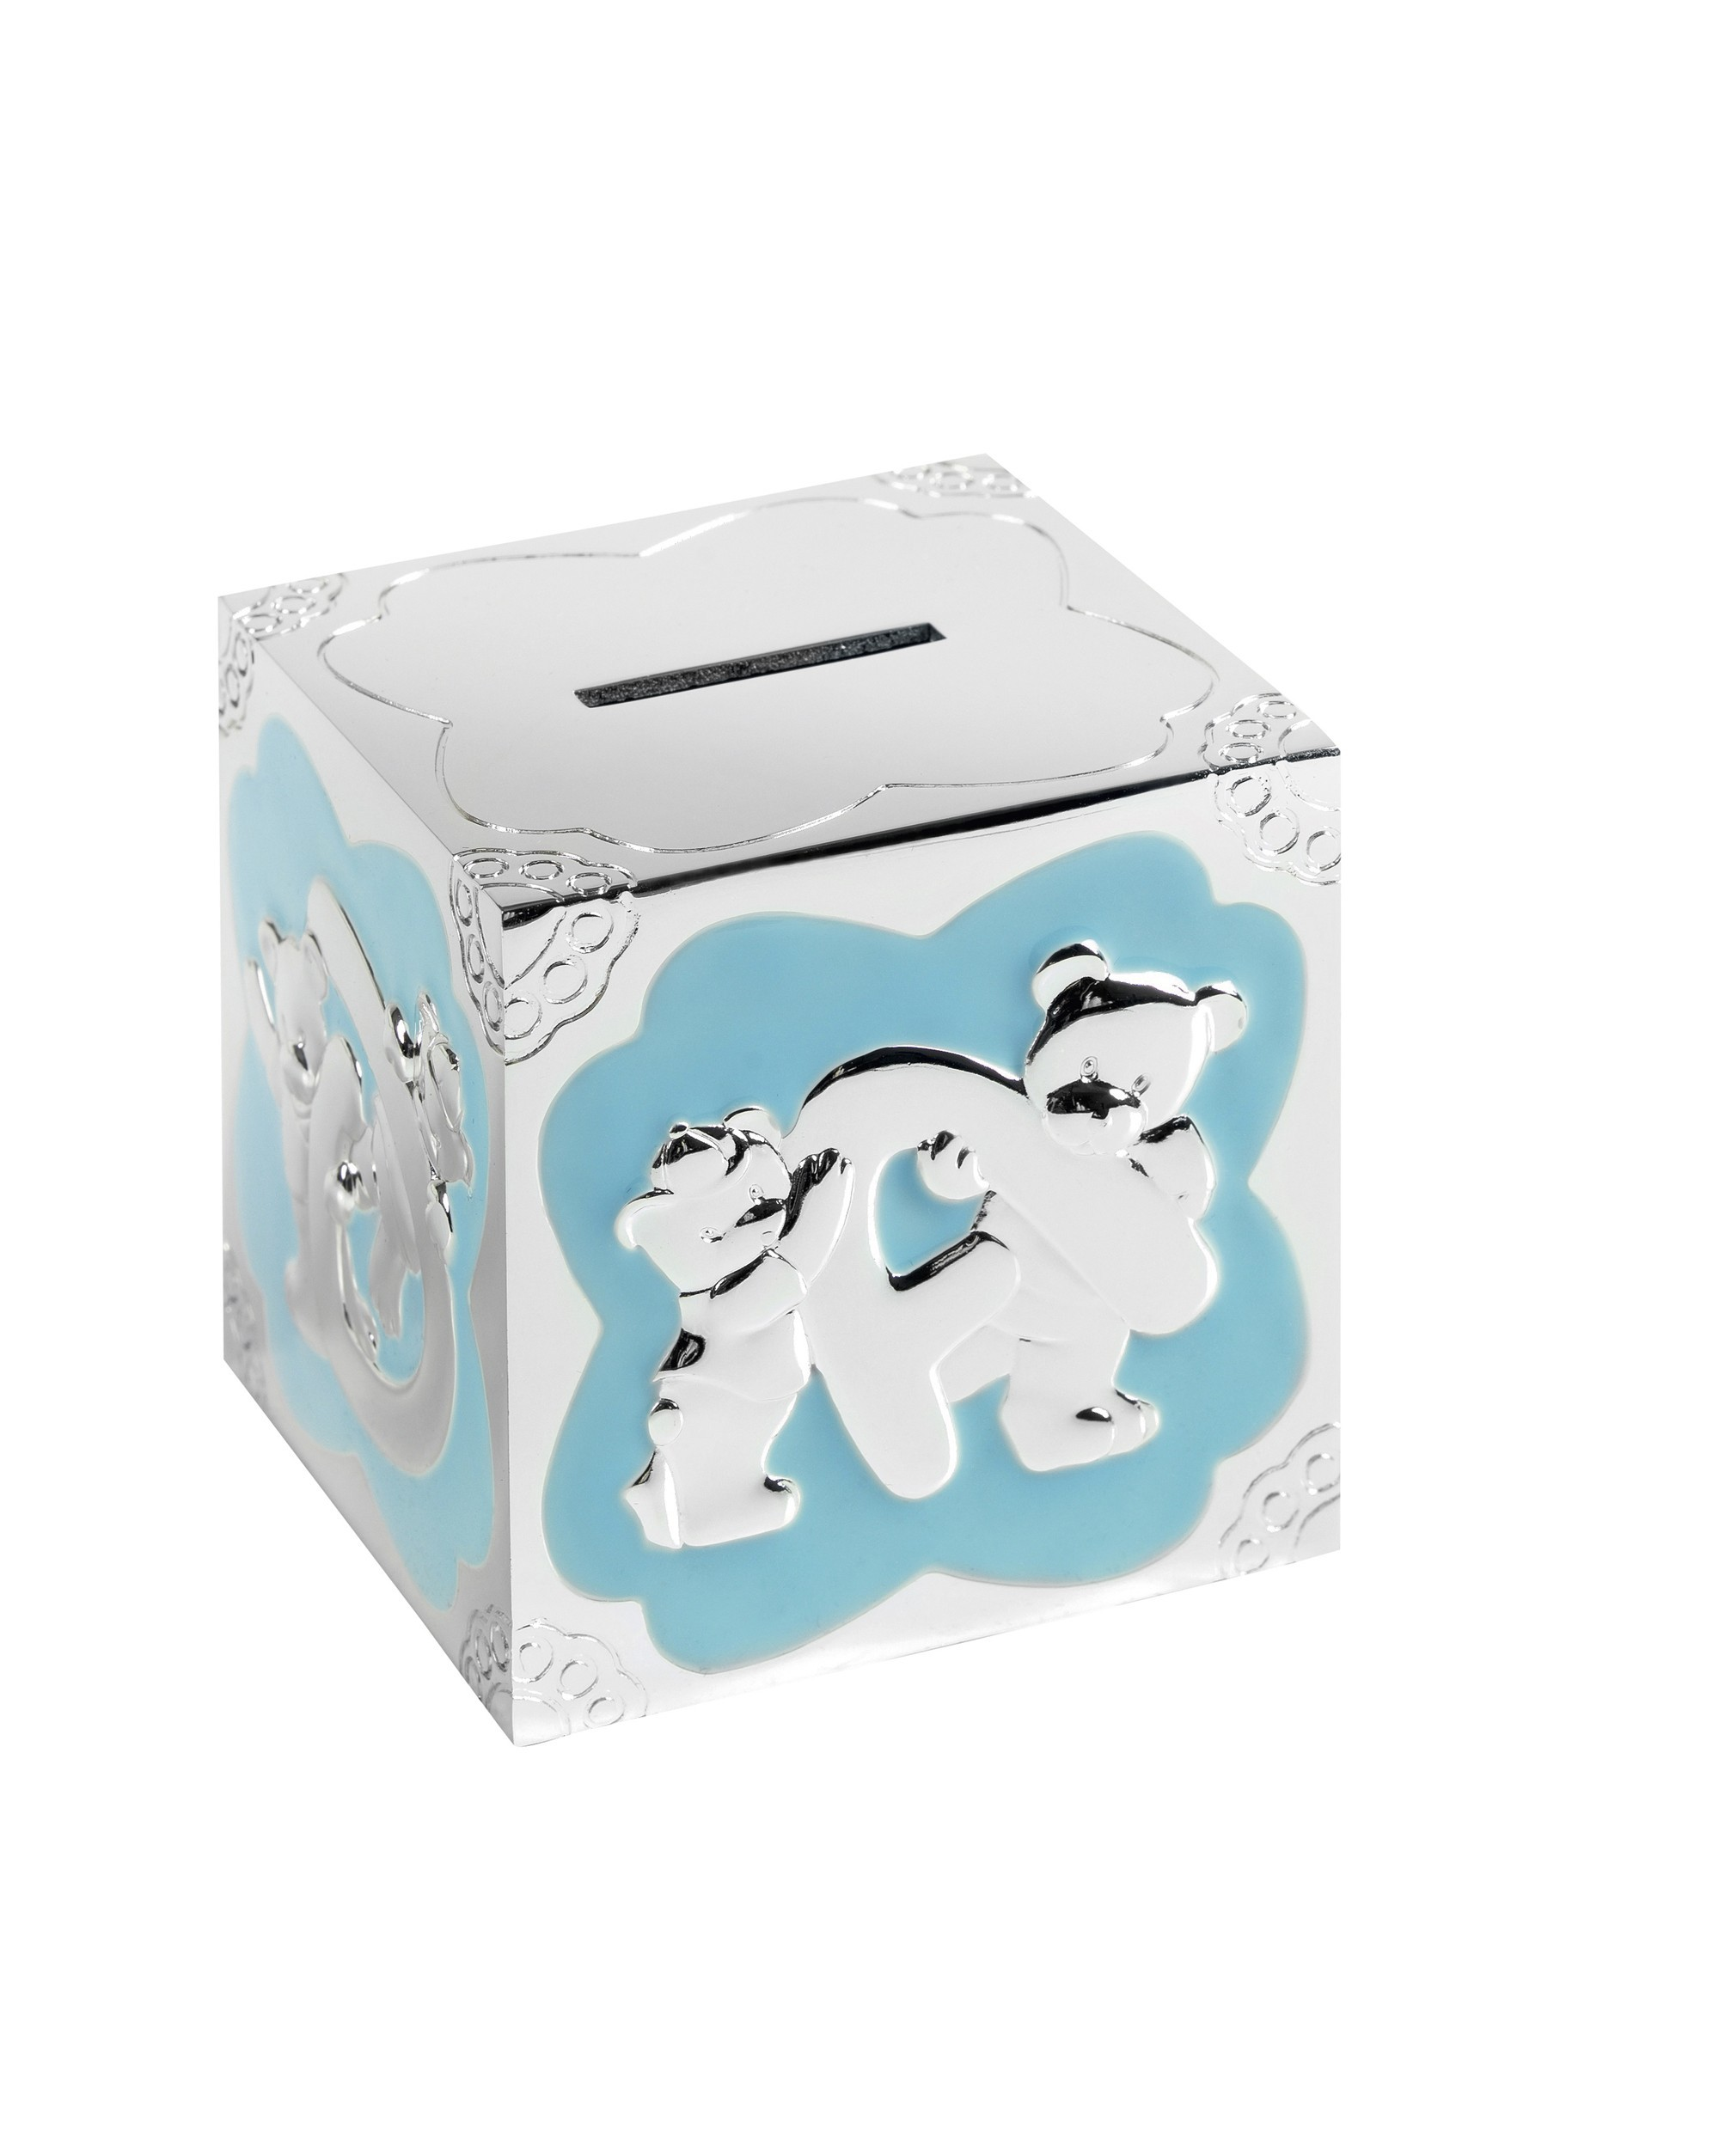 7cm Blue Enml Teddy Cube Money Box